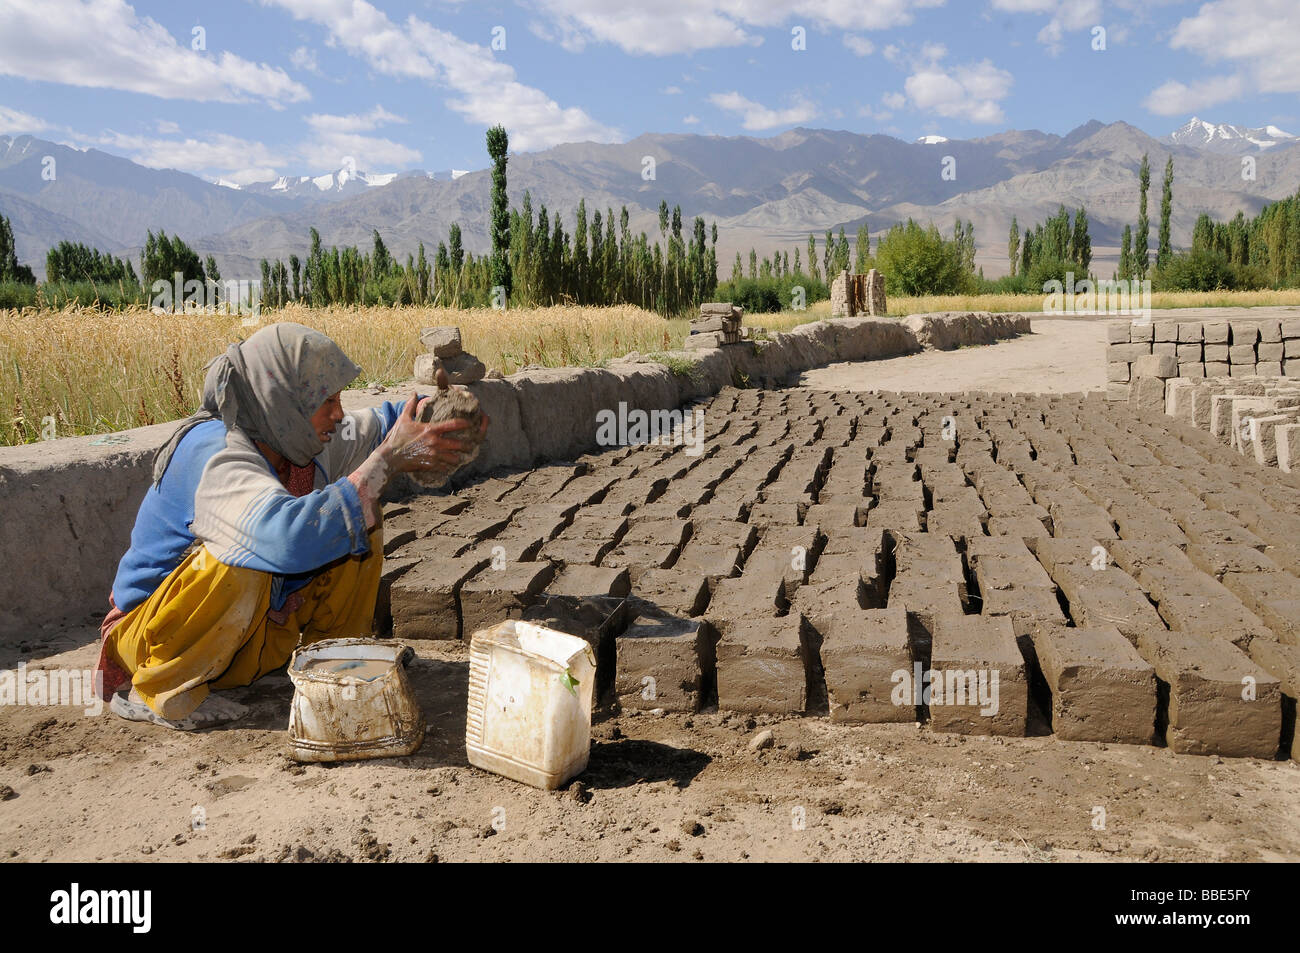 Brickworks, Ladakhi woman kneading clay bricks, Leh, Ladakh, North India, Himalaya - Stock Image